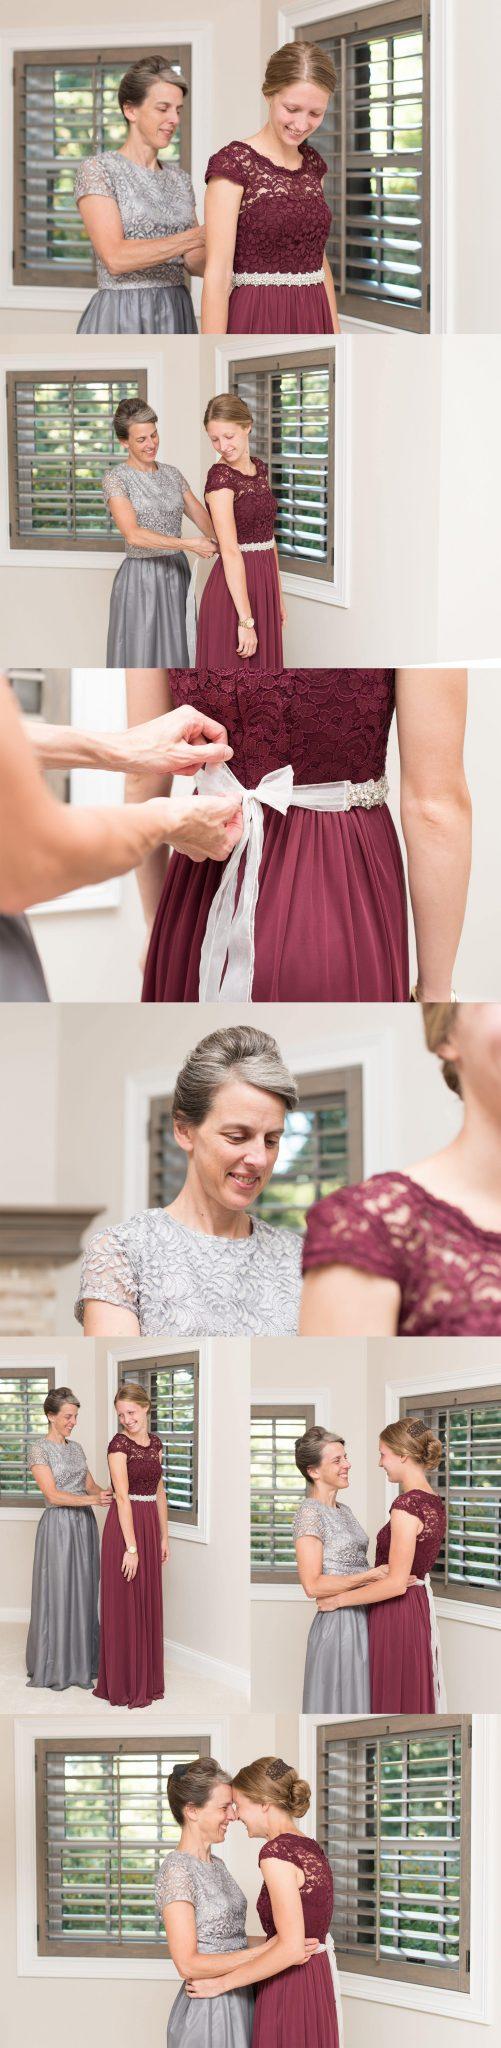 Mr. & Mrs. Lee Blume: An Apostolic Christian Wedding | Luminant Photography | Lafayette, Indiana Wedding Photographer | Laura Walder Blume | Lee Blume | Indiana Wedding Photographer | Remington, Indiana Wedding